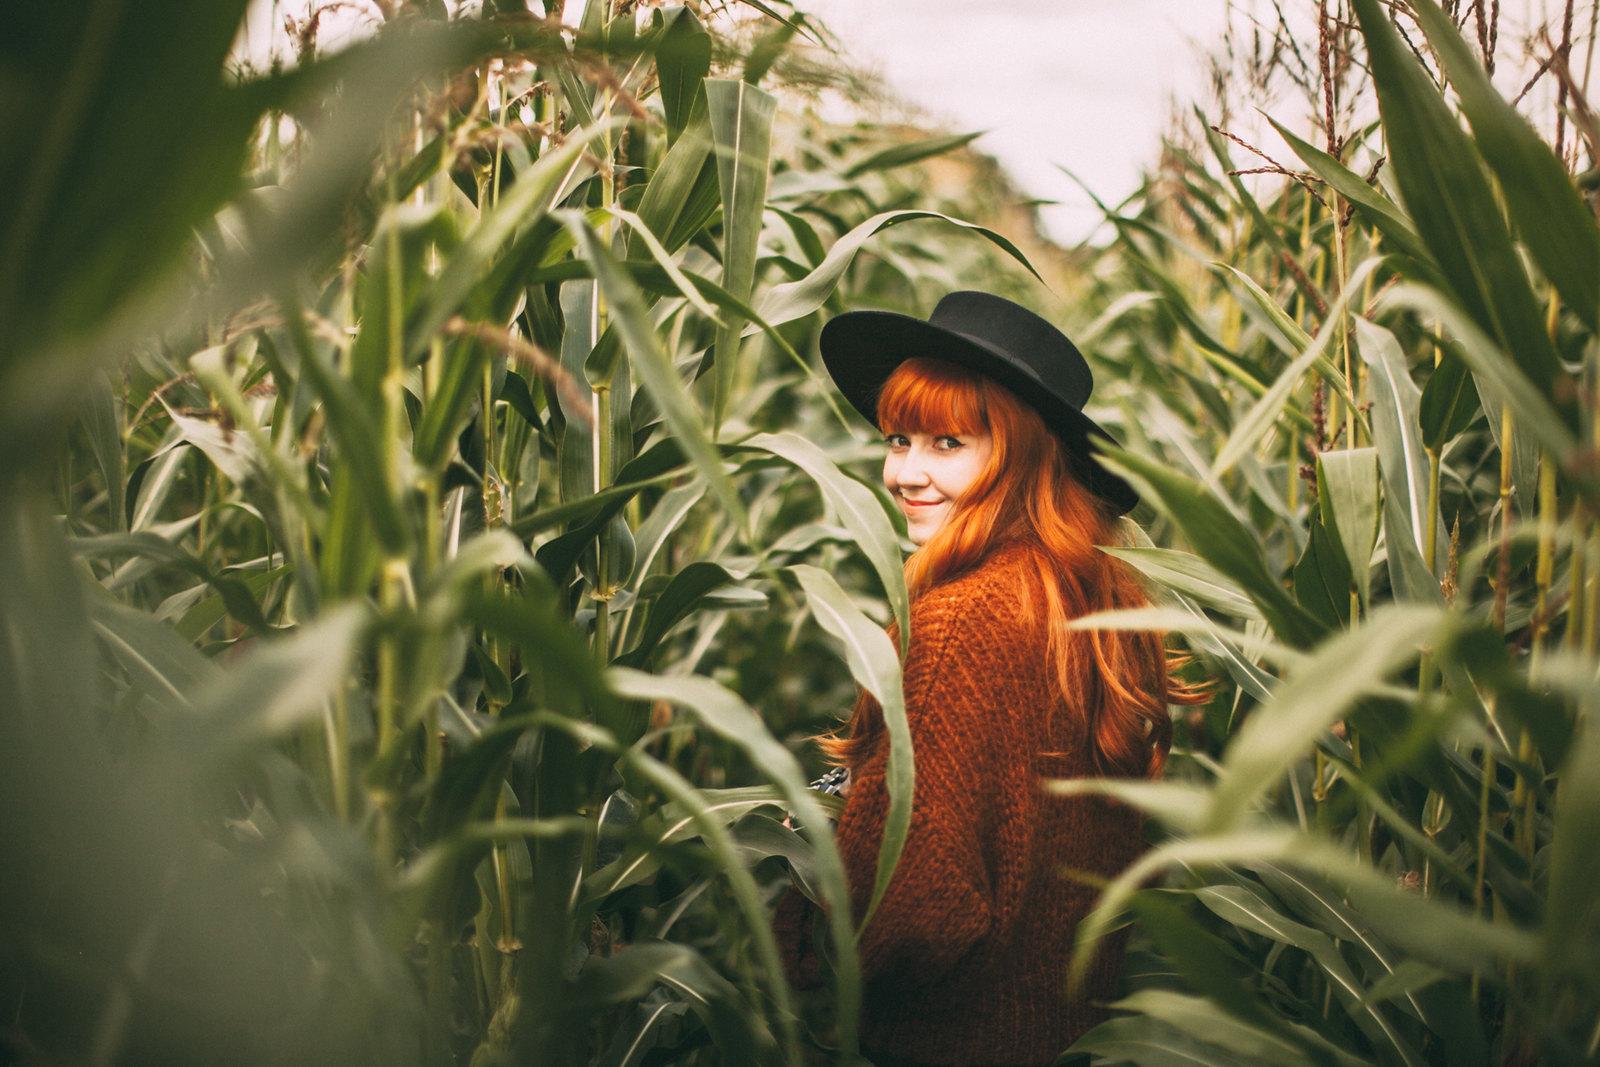 corn field-13